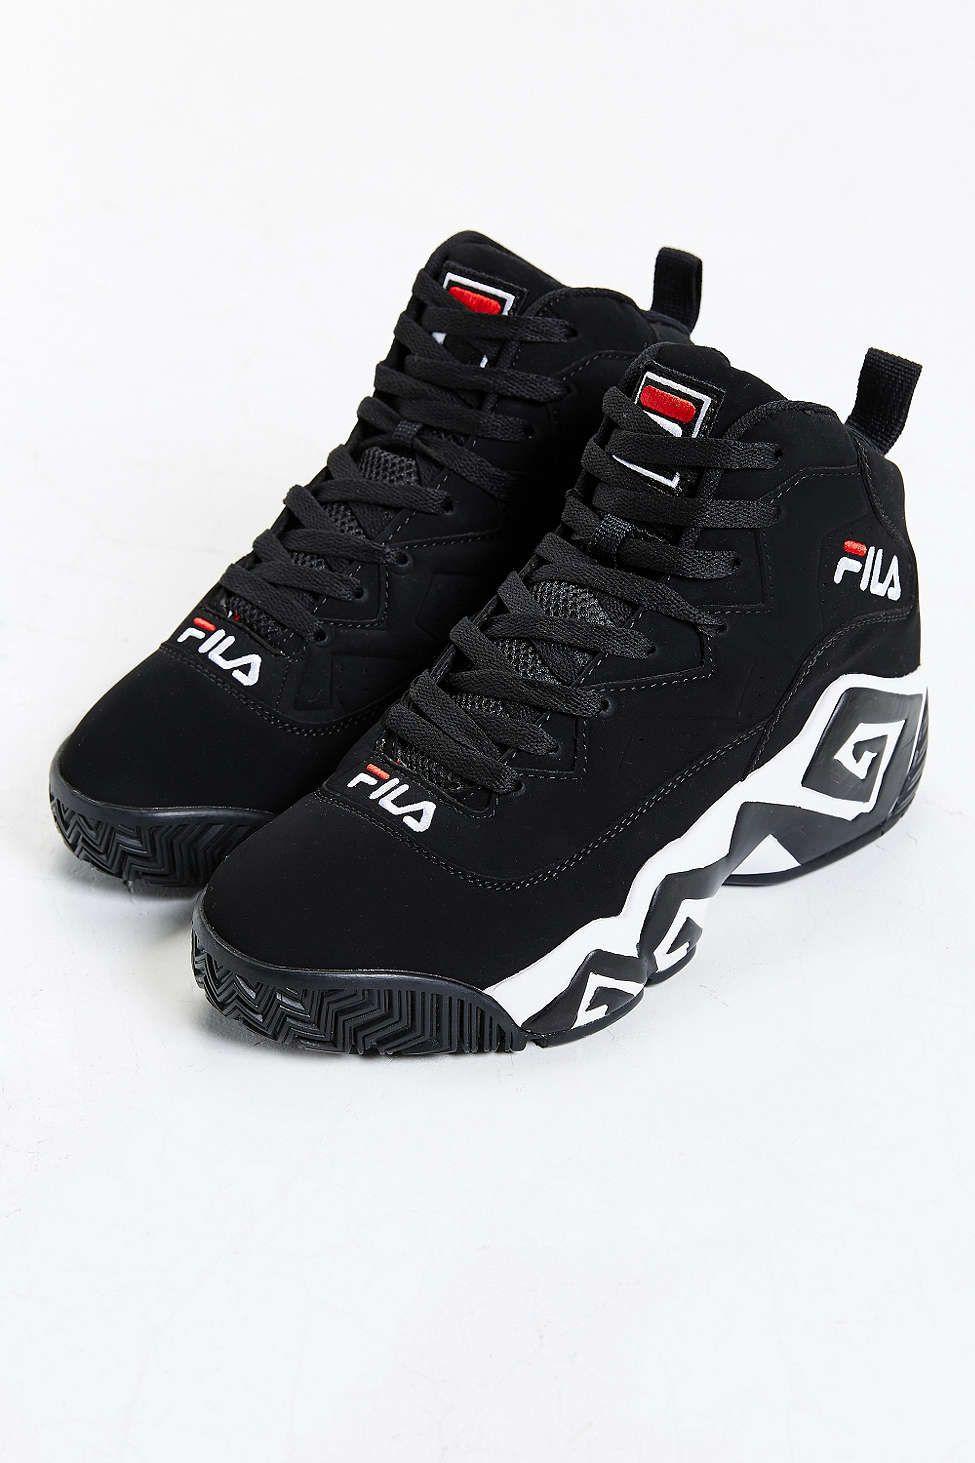 FILA MB Sneaker Joggesko, Sneakers mote, Fila herresko  Sneakers, Sneakers fashion, Fila mens shoes